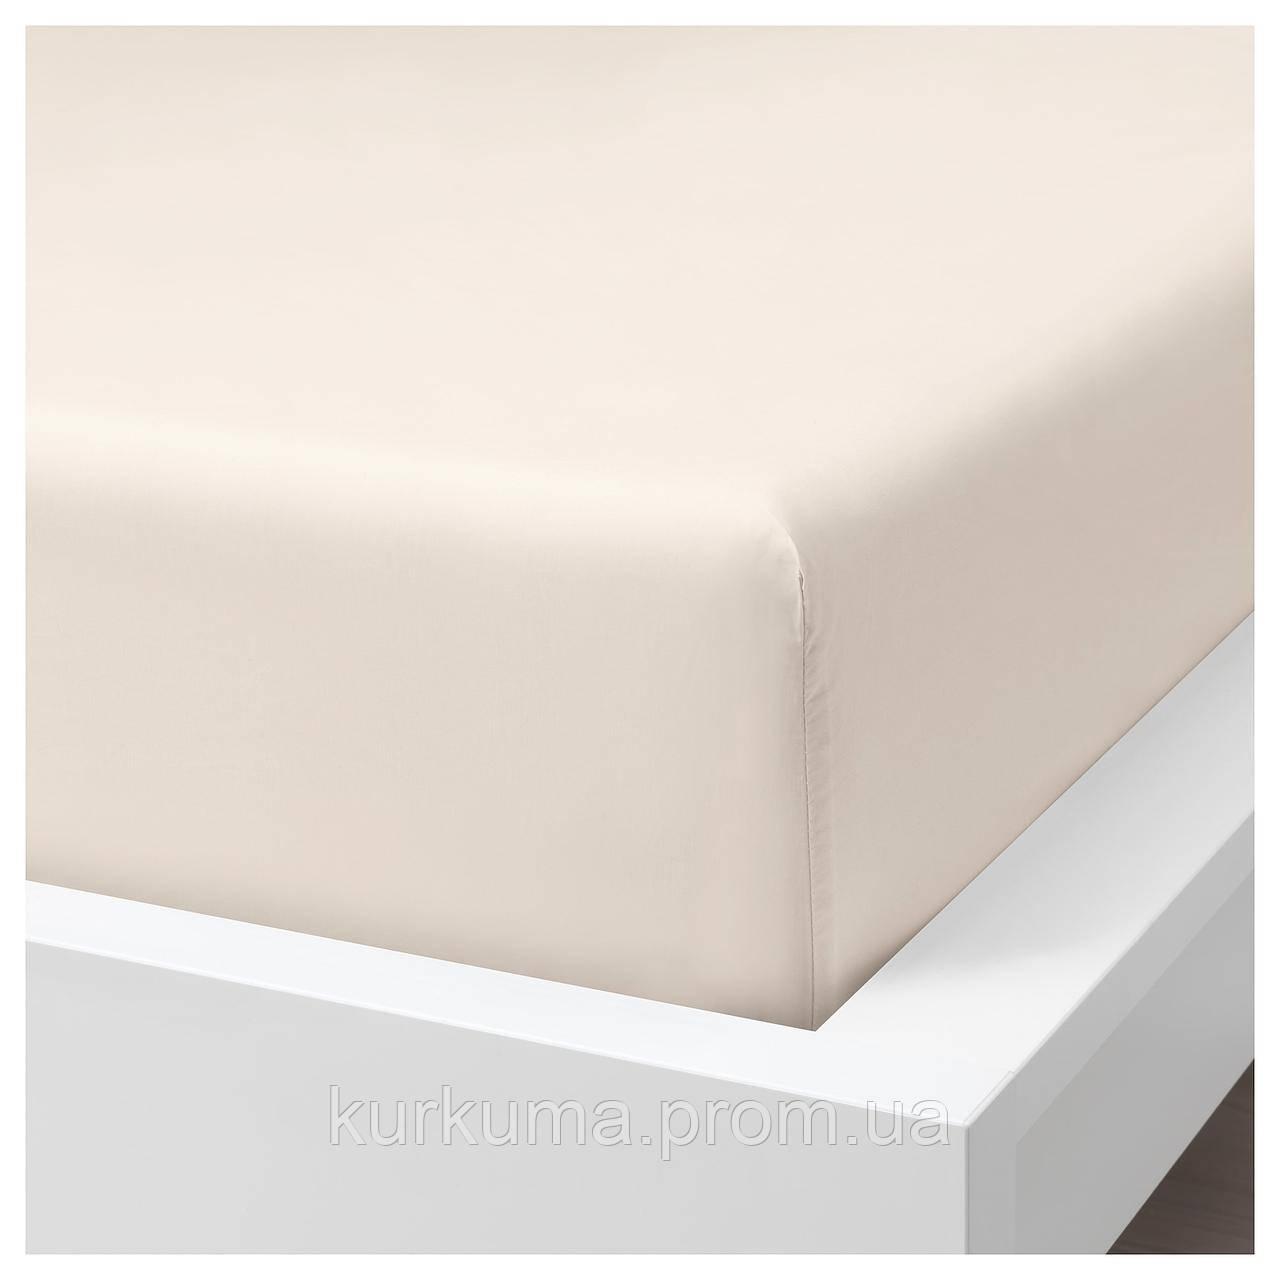 IKEA SOMNTUTA Простыня, светло-бежевый  (804.127.85)